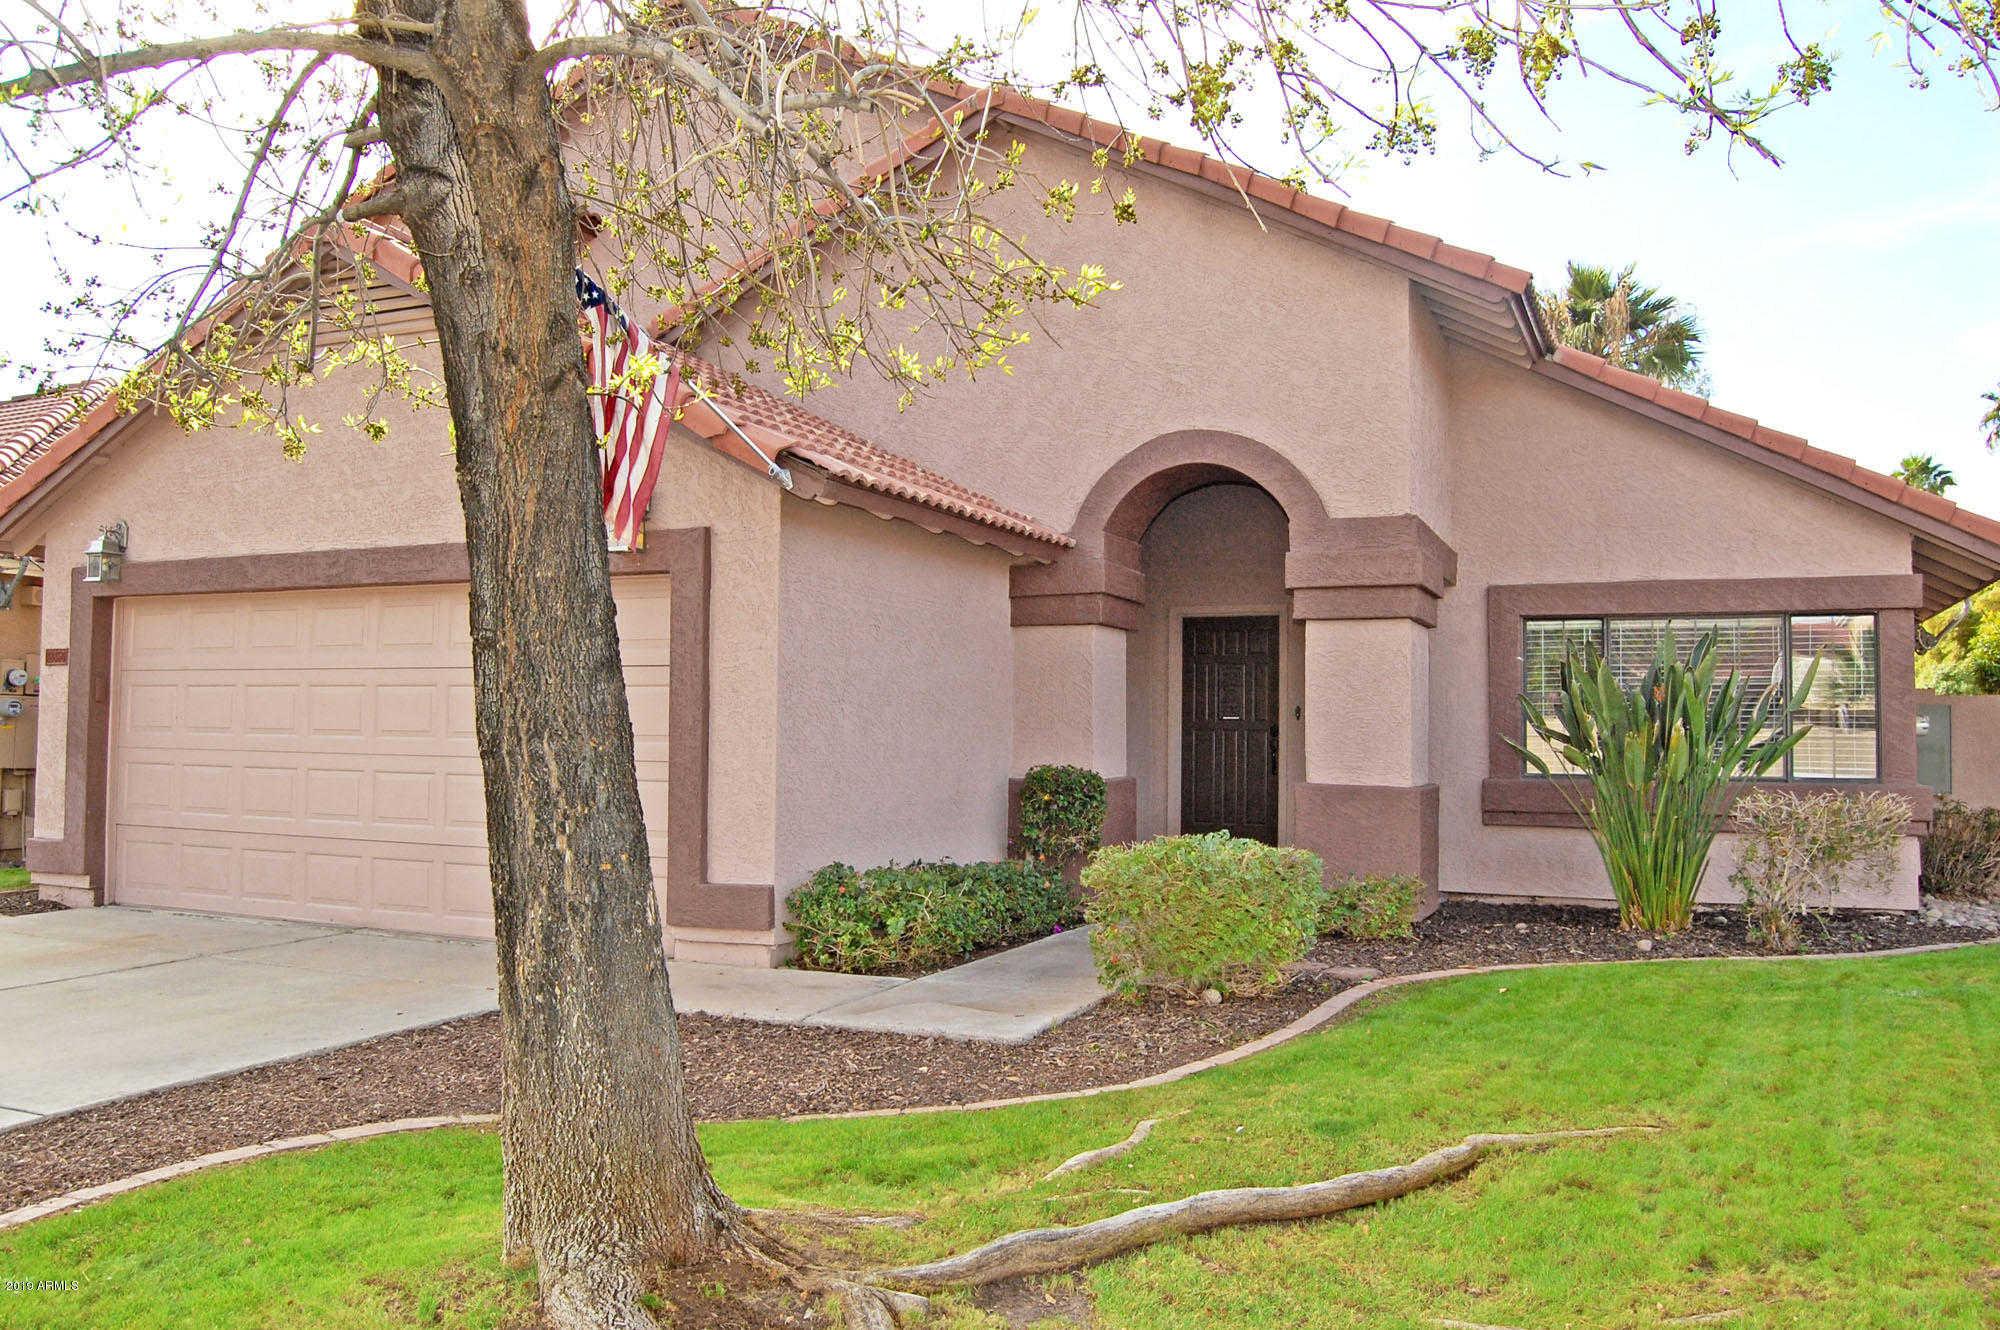 $339,500 - 4Br/3Ba - Home for Sale in Arrowhead Ranch 3 Amd Lot 1-225 Tr A, Glendale